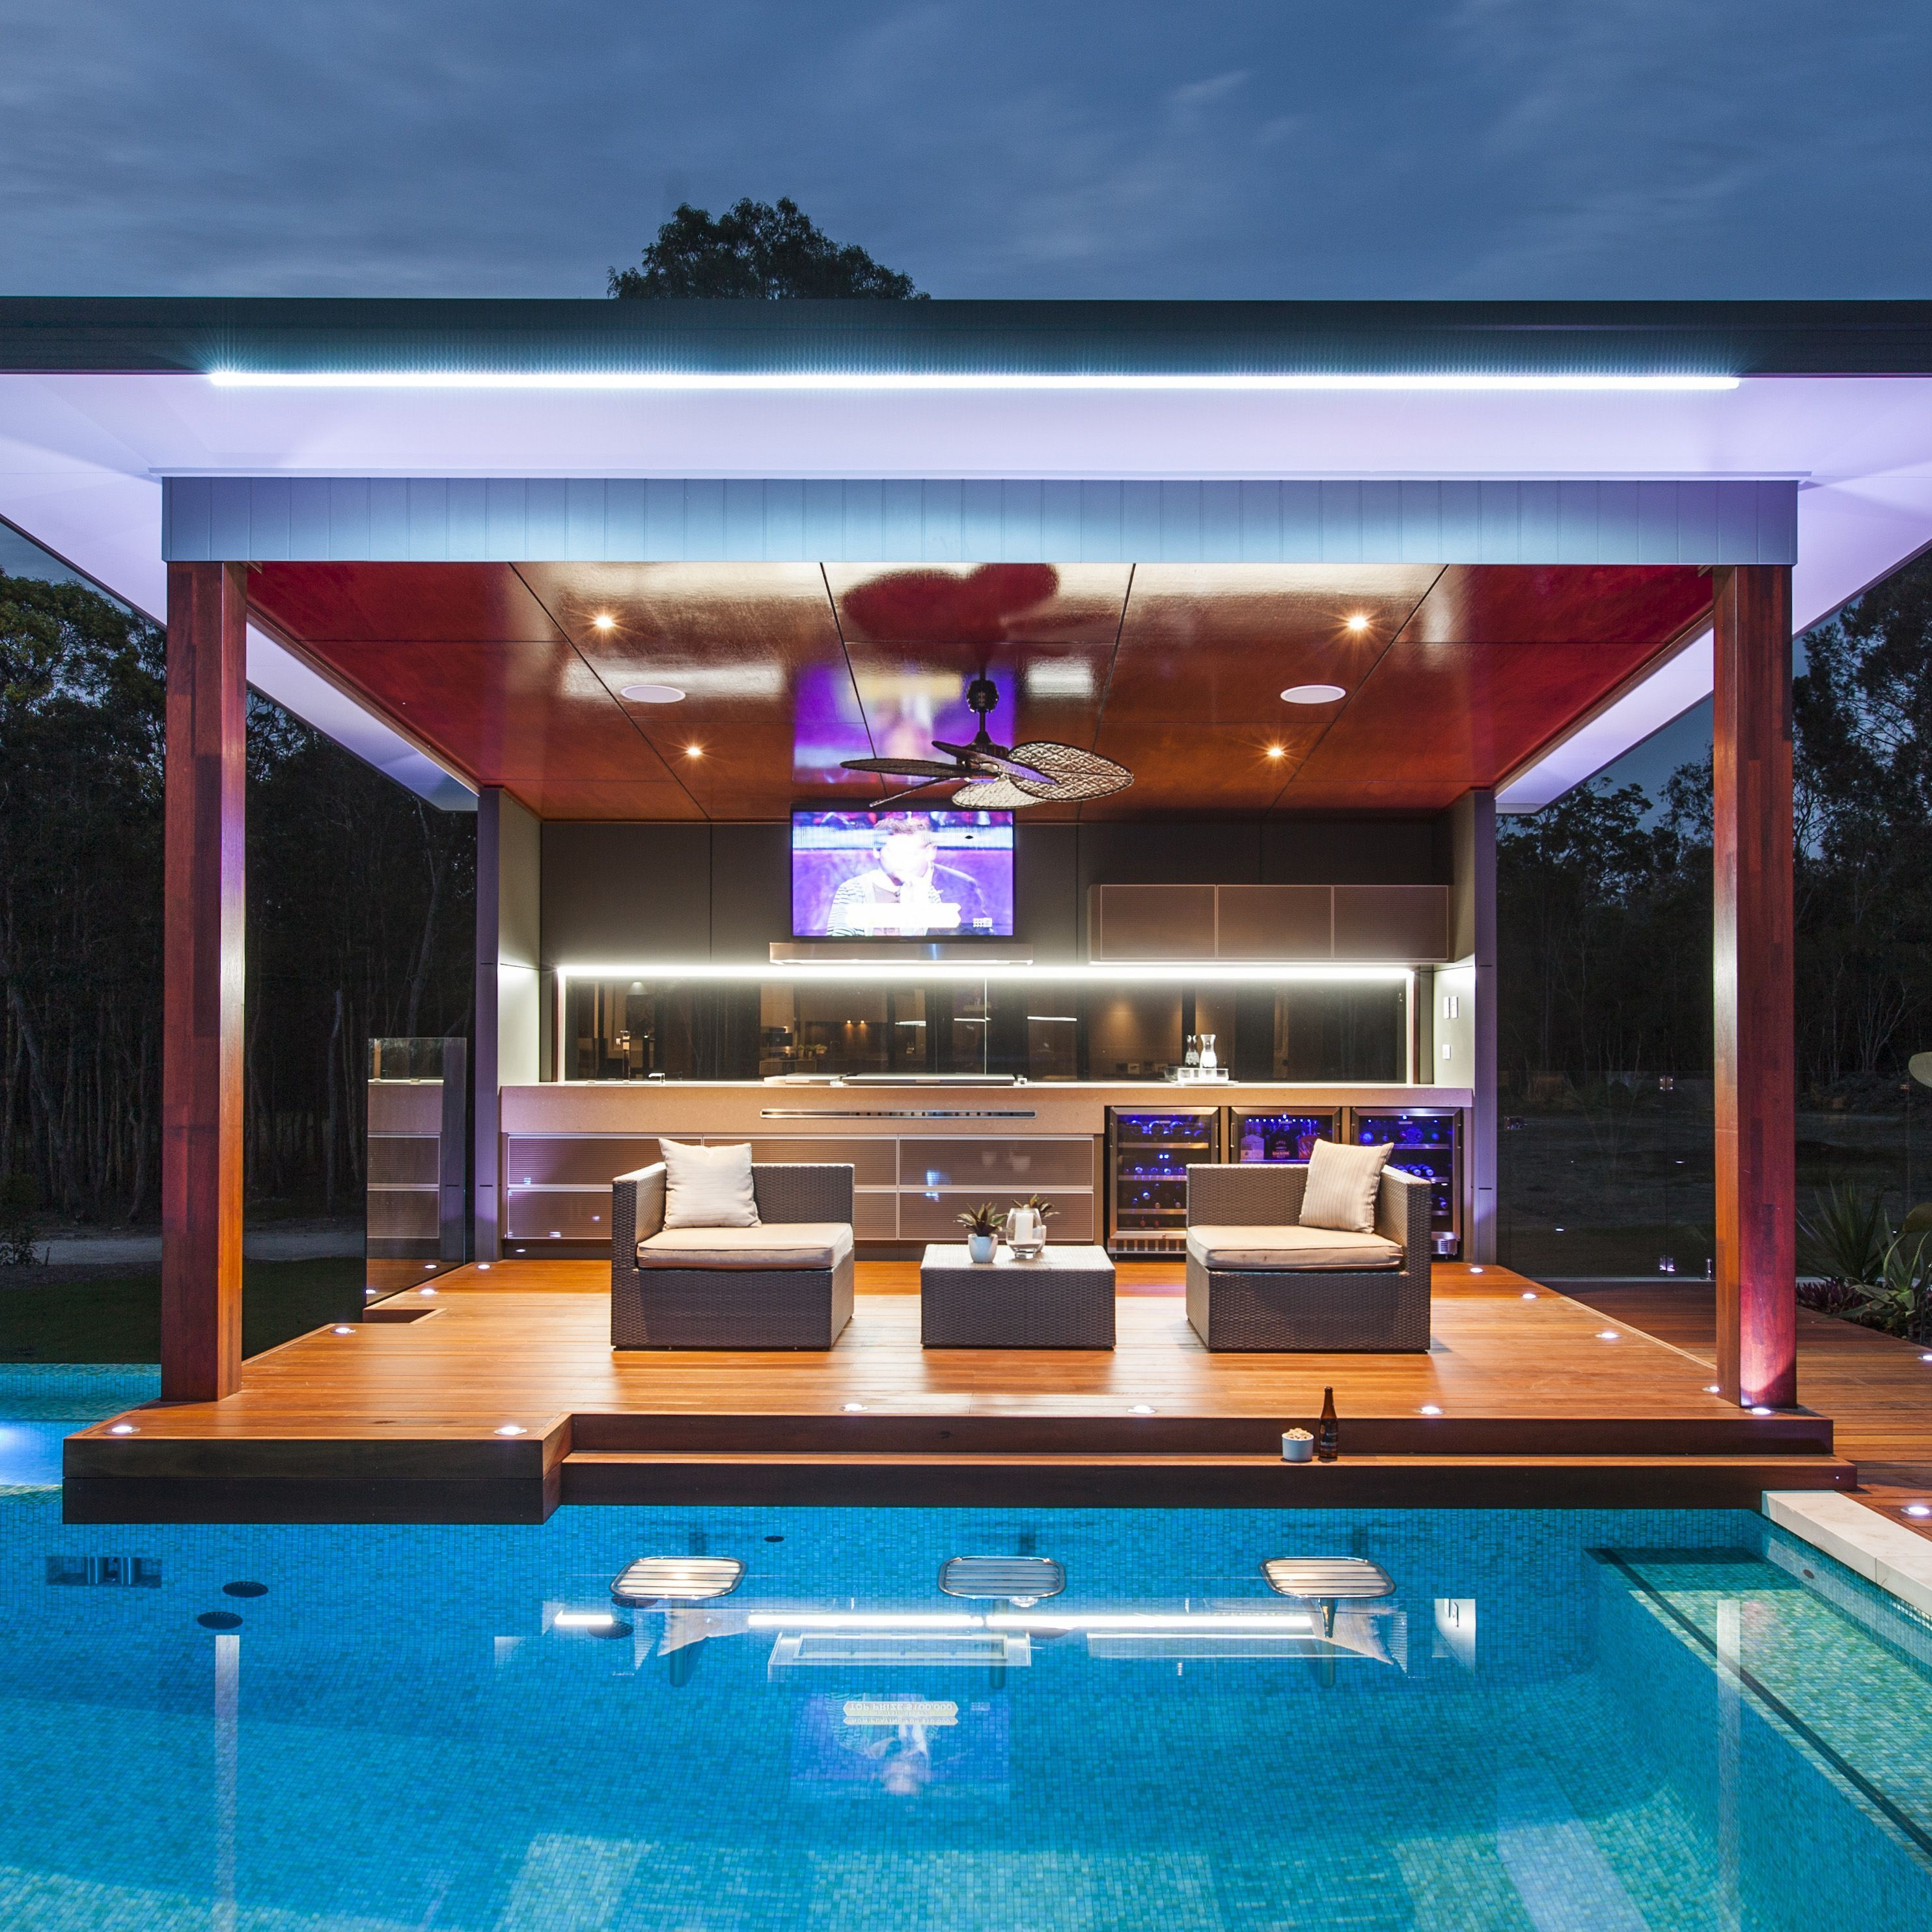 Sydney Living Pools Outdoor Design No 2 5 Landscaping Landscape Design Company Rolling Stone Landscapes Sydn Outdoor Rooms Modern Pools Outdoor Design